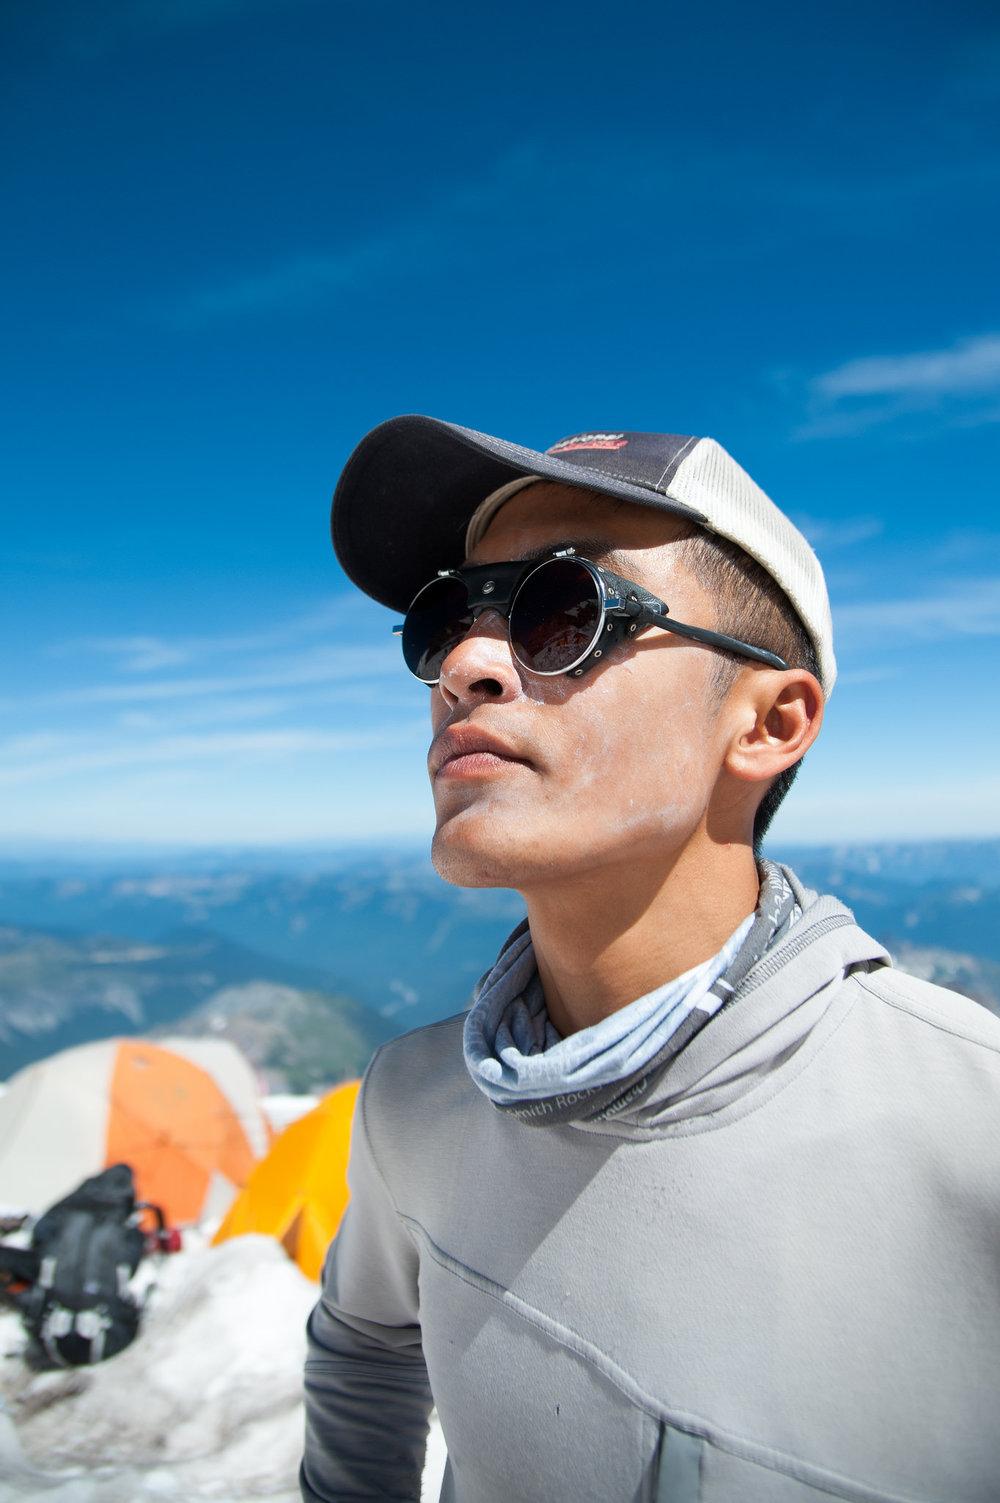 Mountaineering guide Don Nguyen at Ingraham Glacier on Mt. Rainier (Photo credit: Dan Bott)